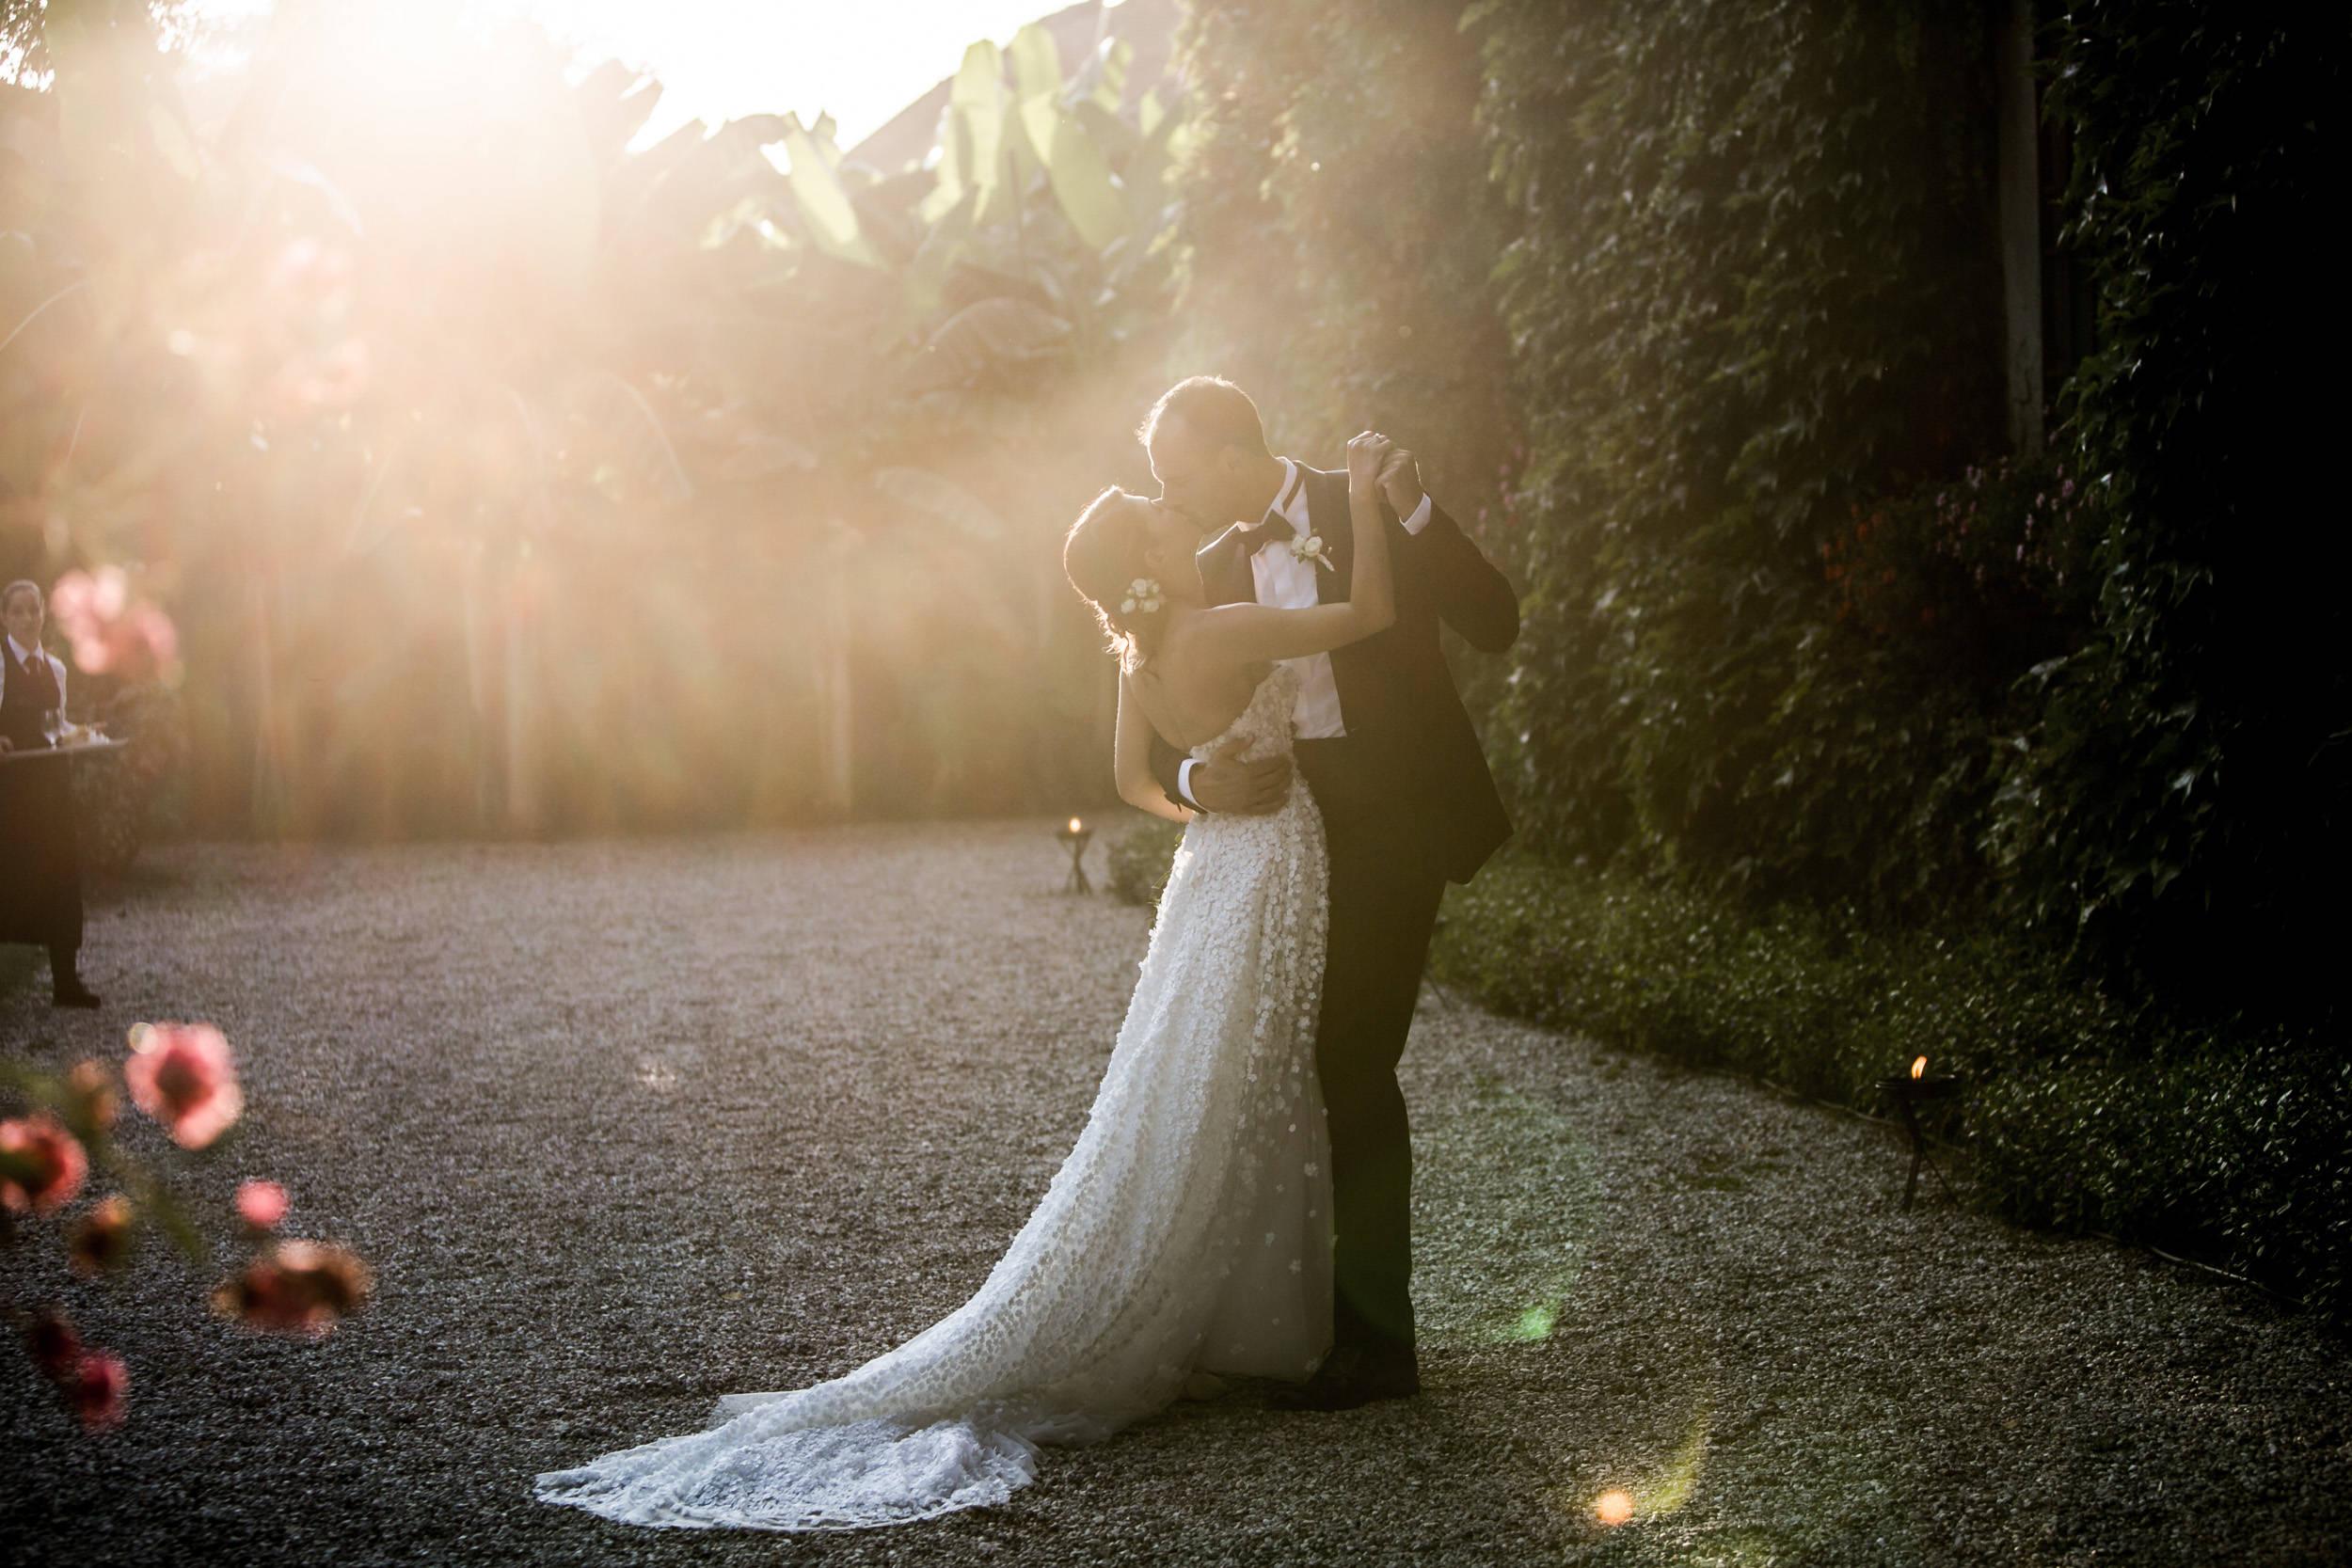 matrimonio_villa-ferrari-gussola_MI-078